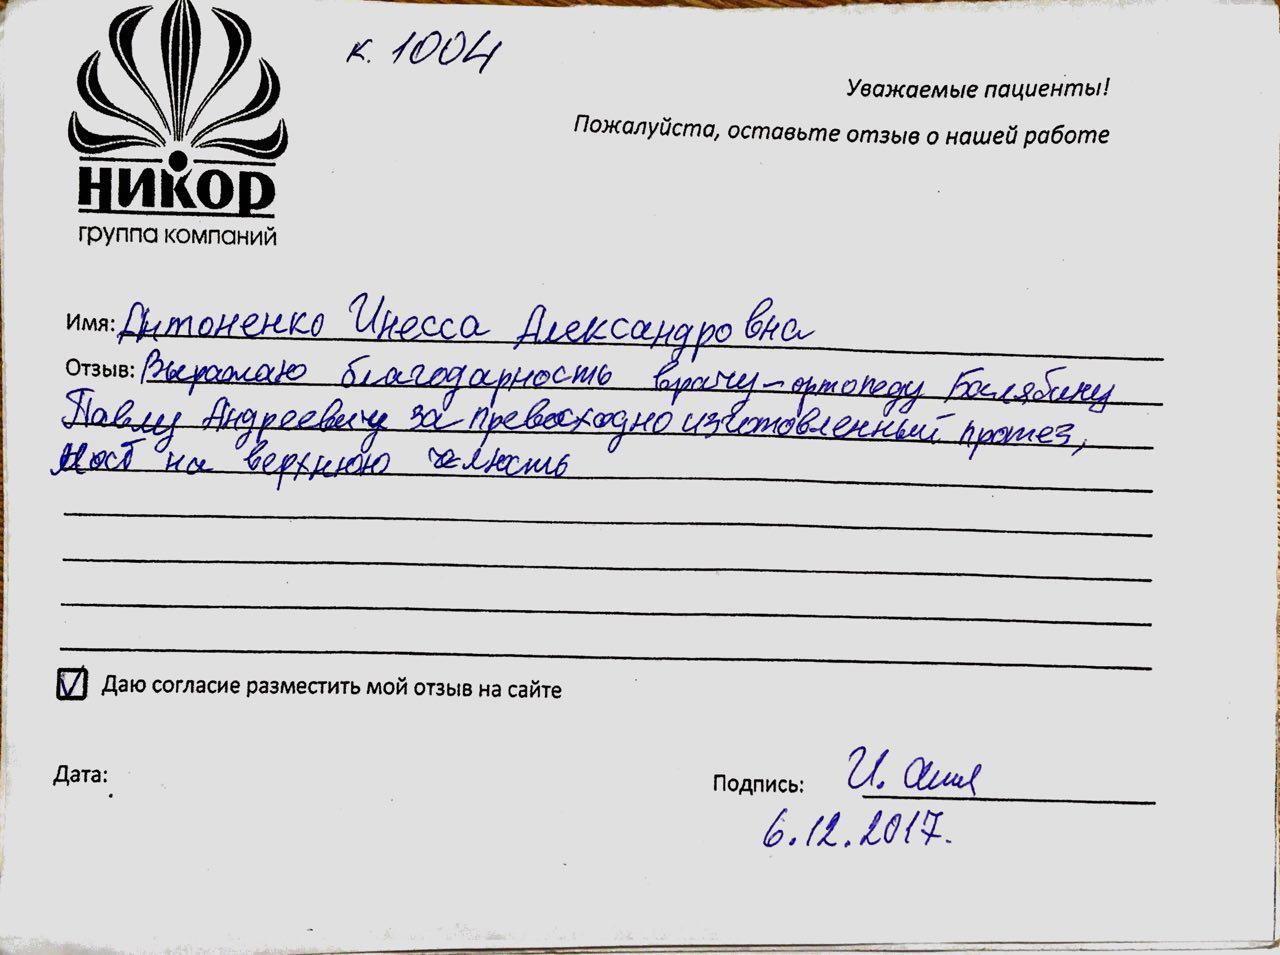 Антоненко Инесса Александровна